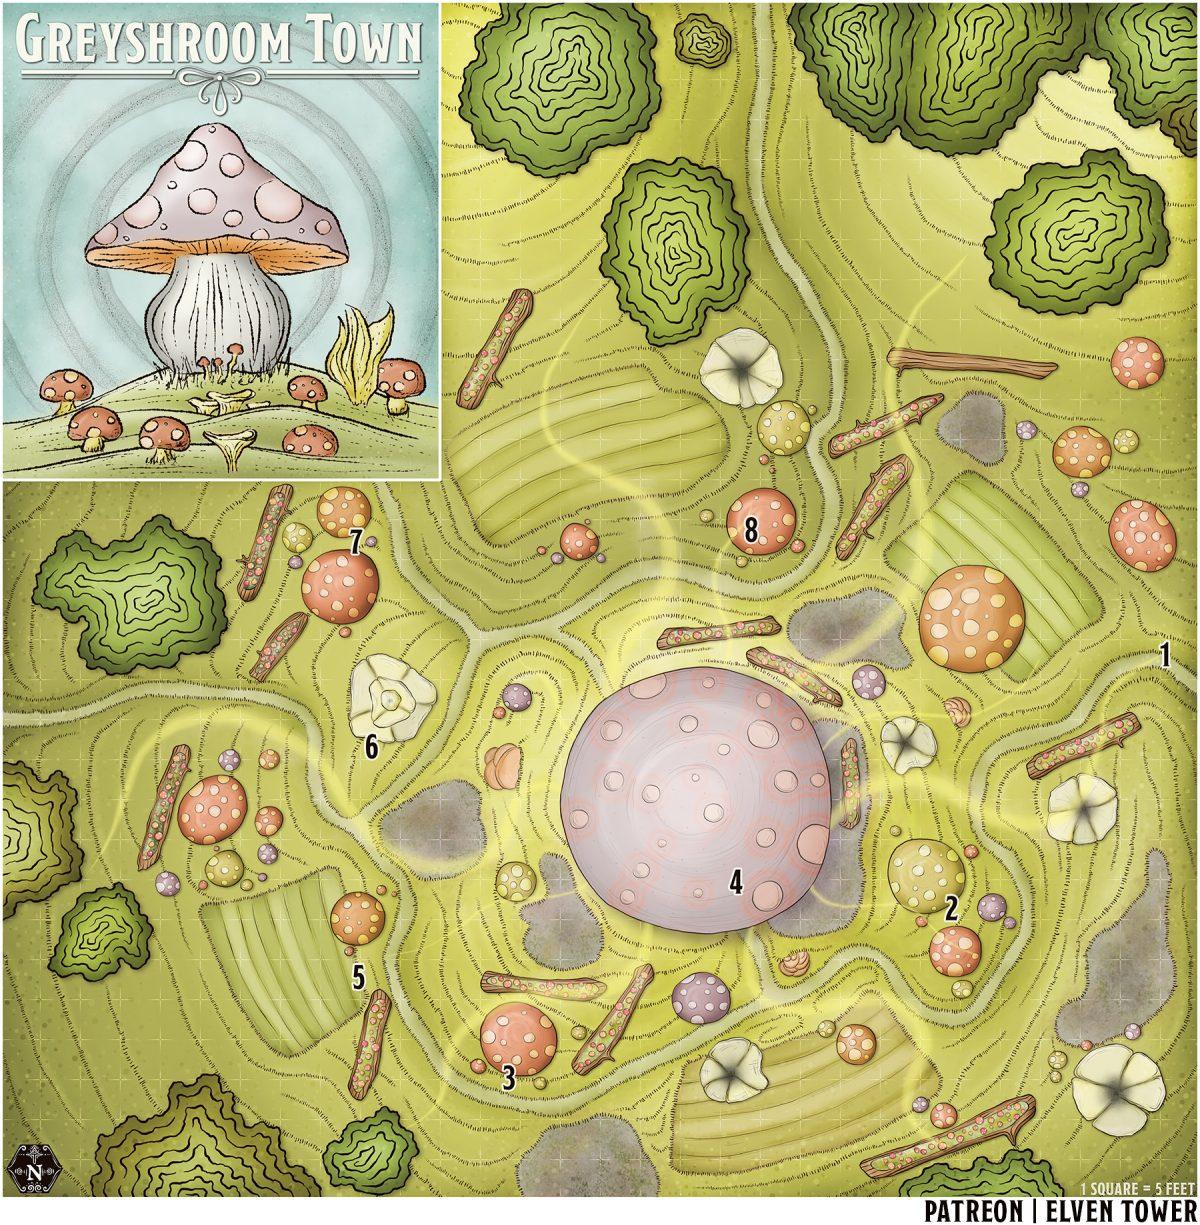 Hexcrawl Series No. 19 – Greyshroom Town